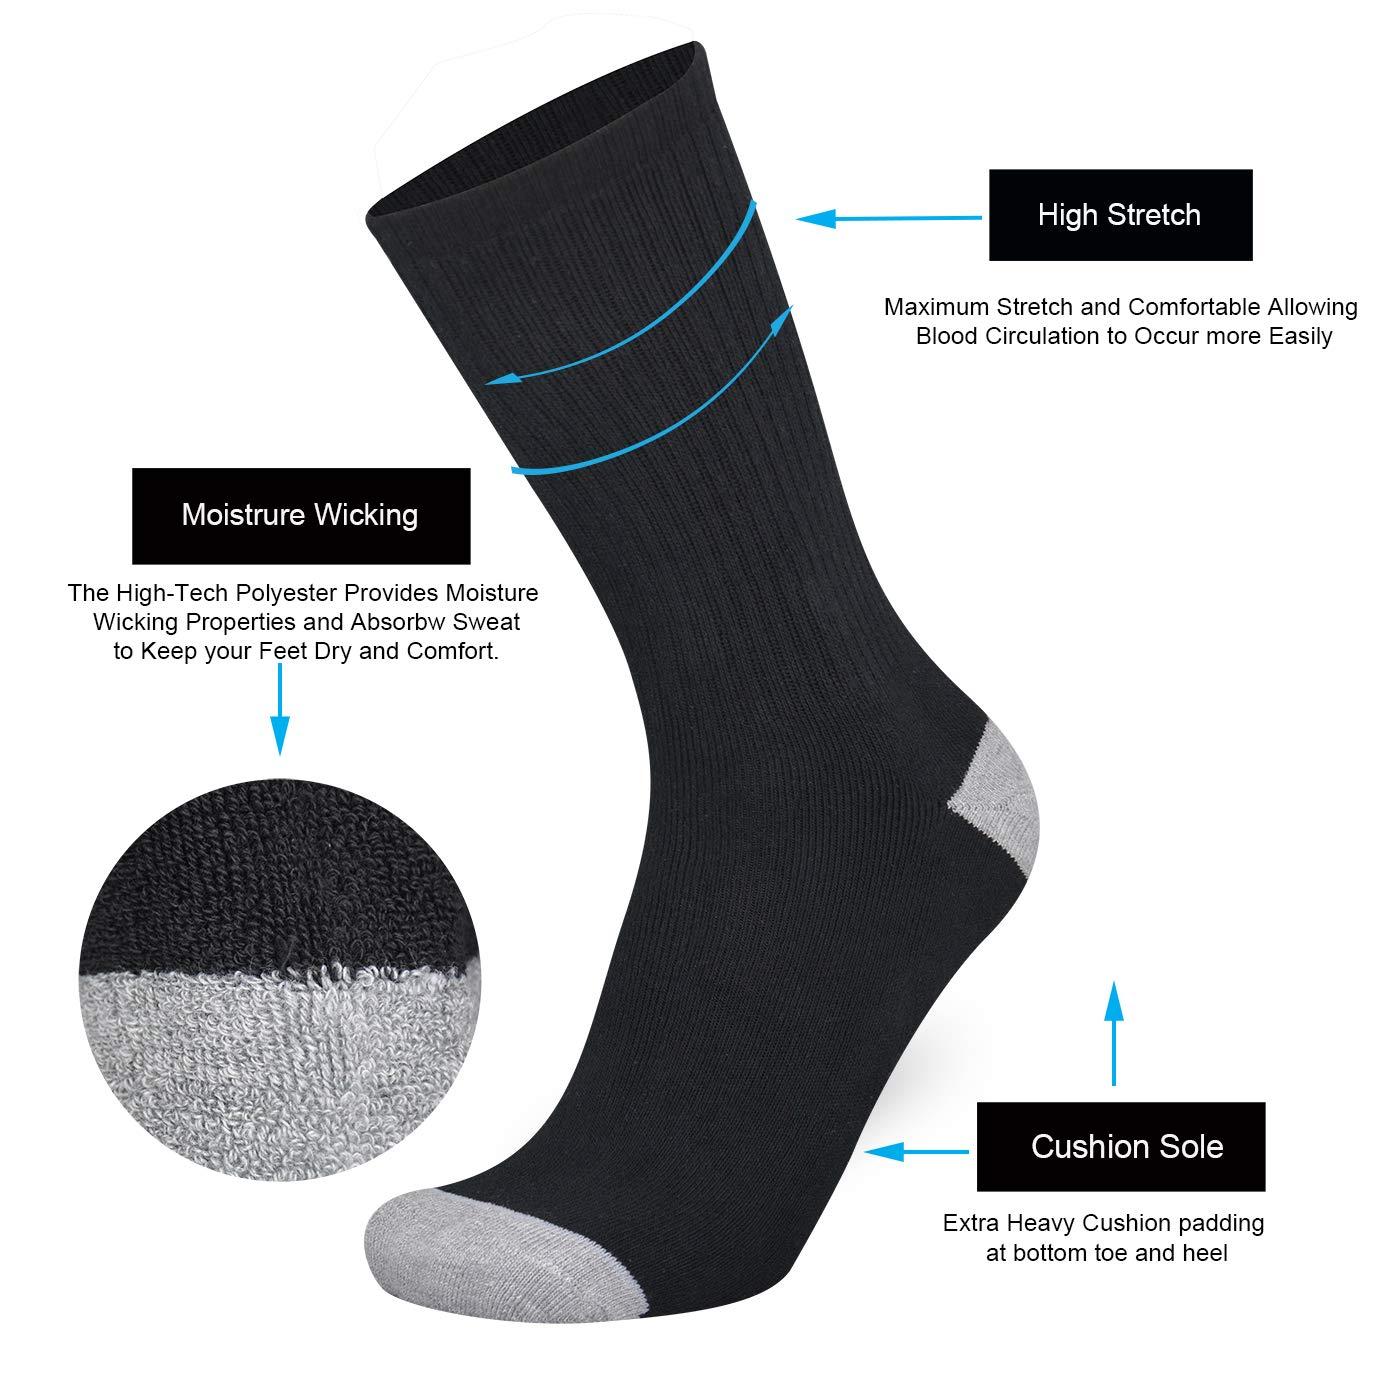 KIRINLAND Mens 10 Pack of Cotton Moisture Wicking Extra Heavy Cushion Athletic Work Crew Socks